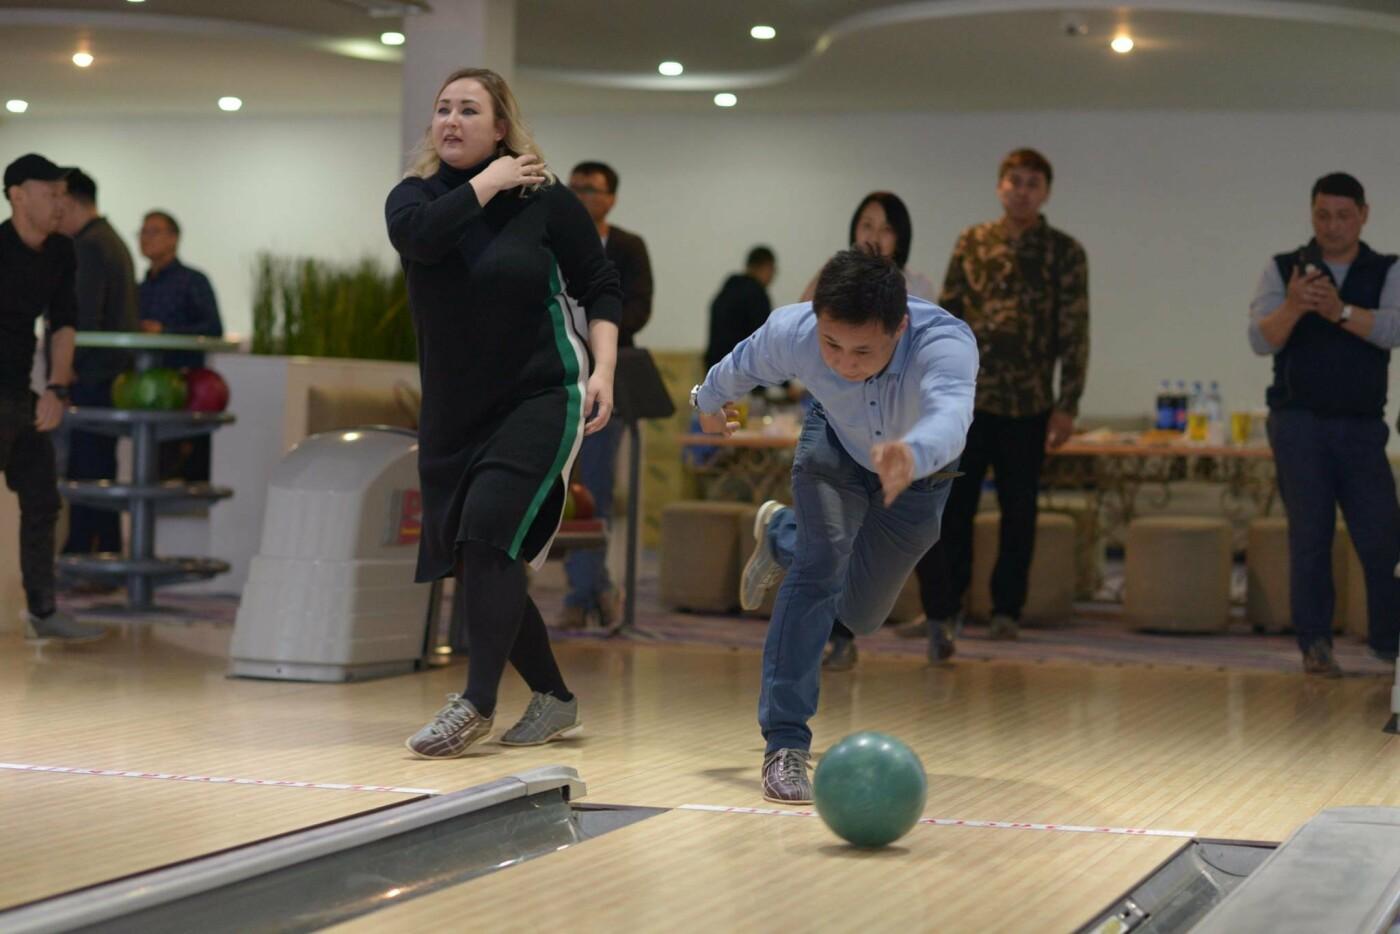 II турнир по боулингу среди журналистов прошел в Алматы (ФОТО), фото-2